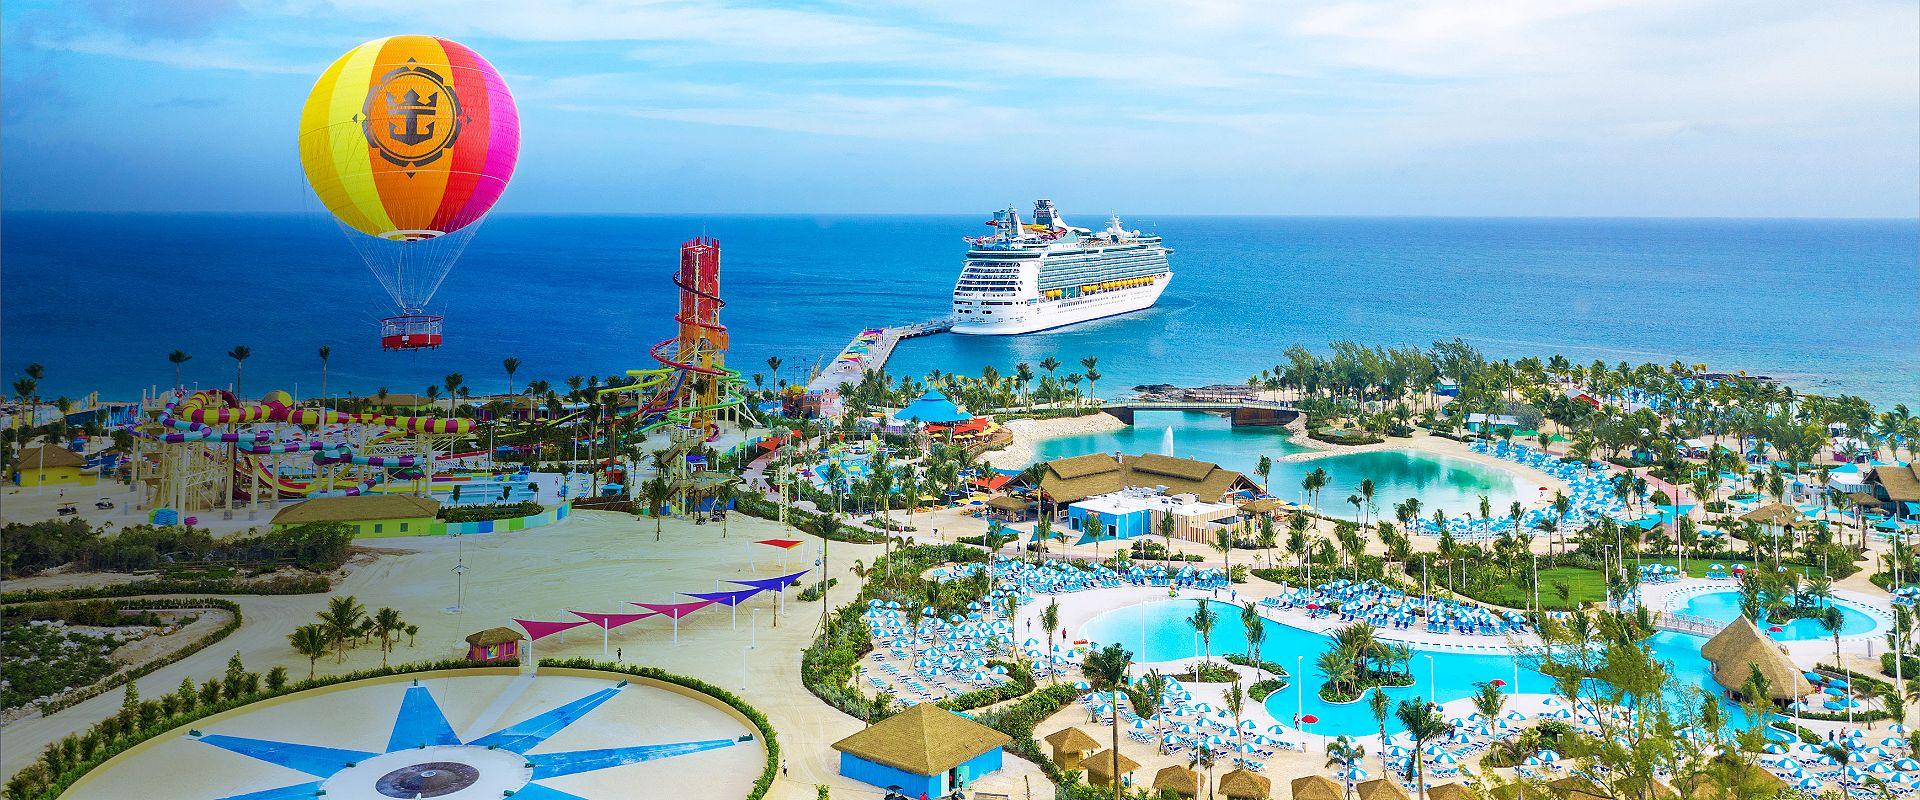 Royal Caribbean Cruises: Vacations and Cruise Deals